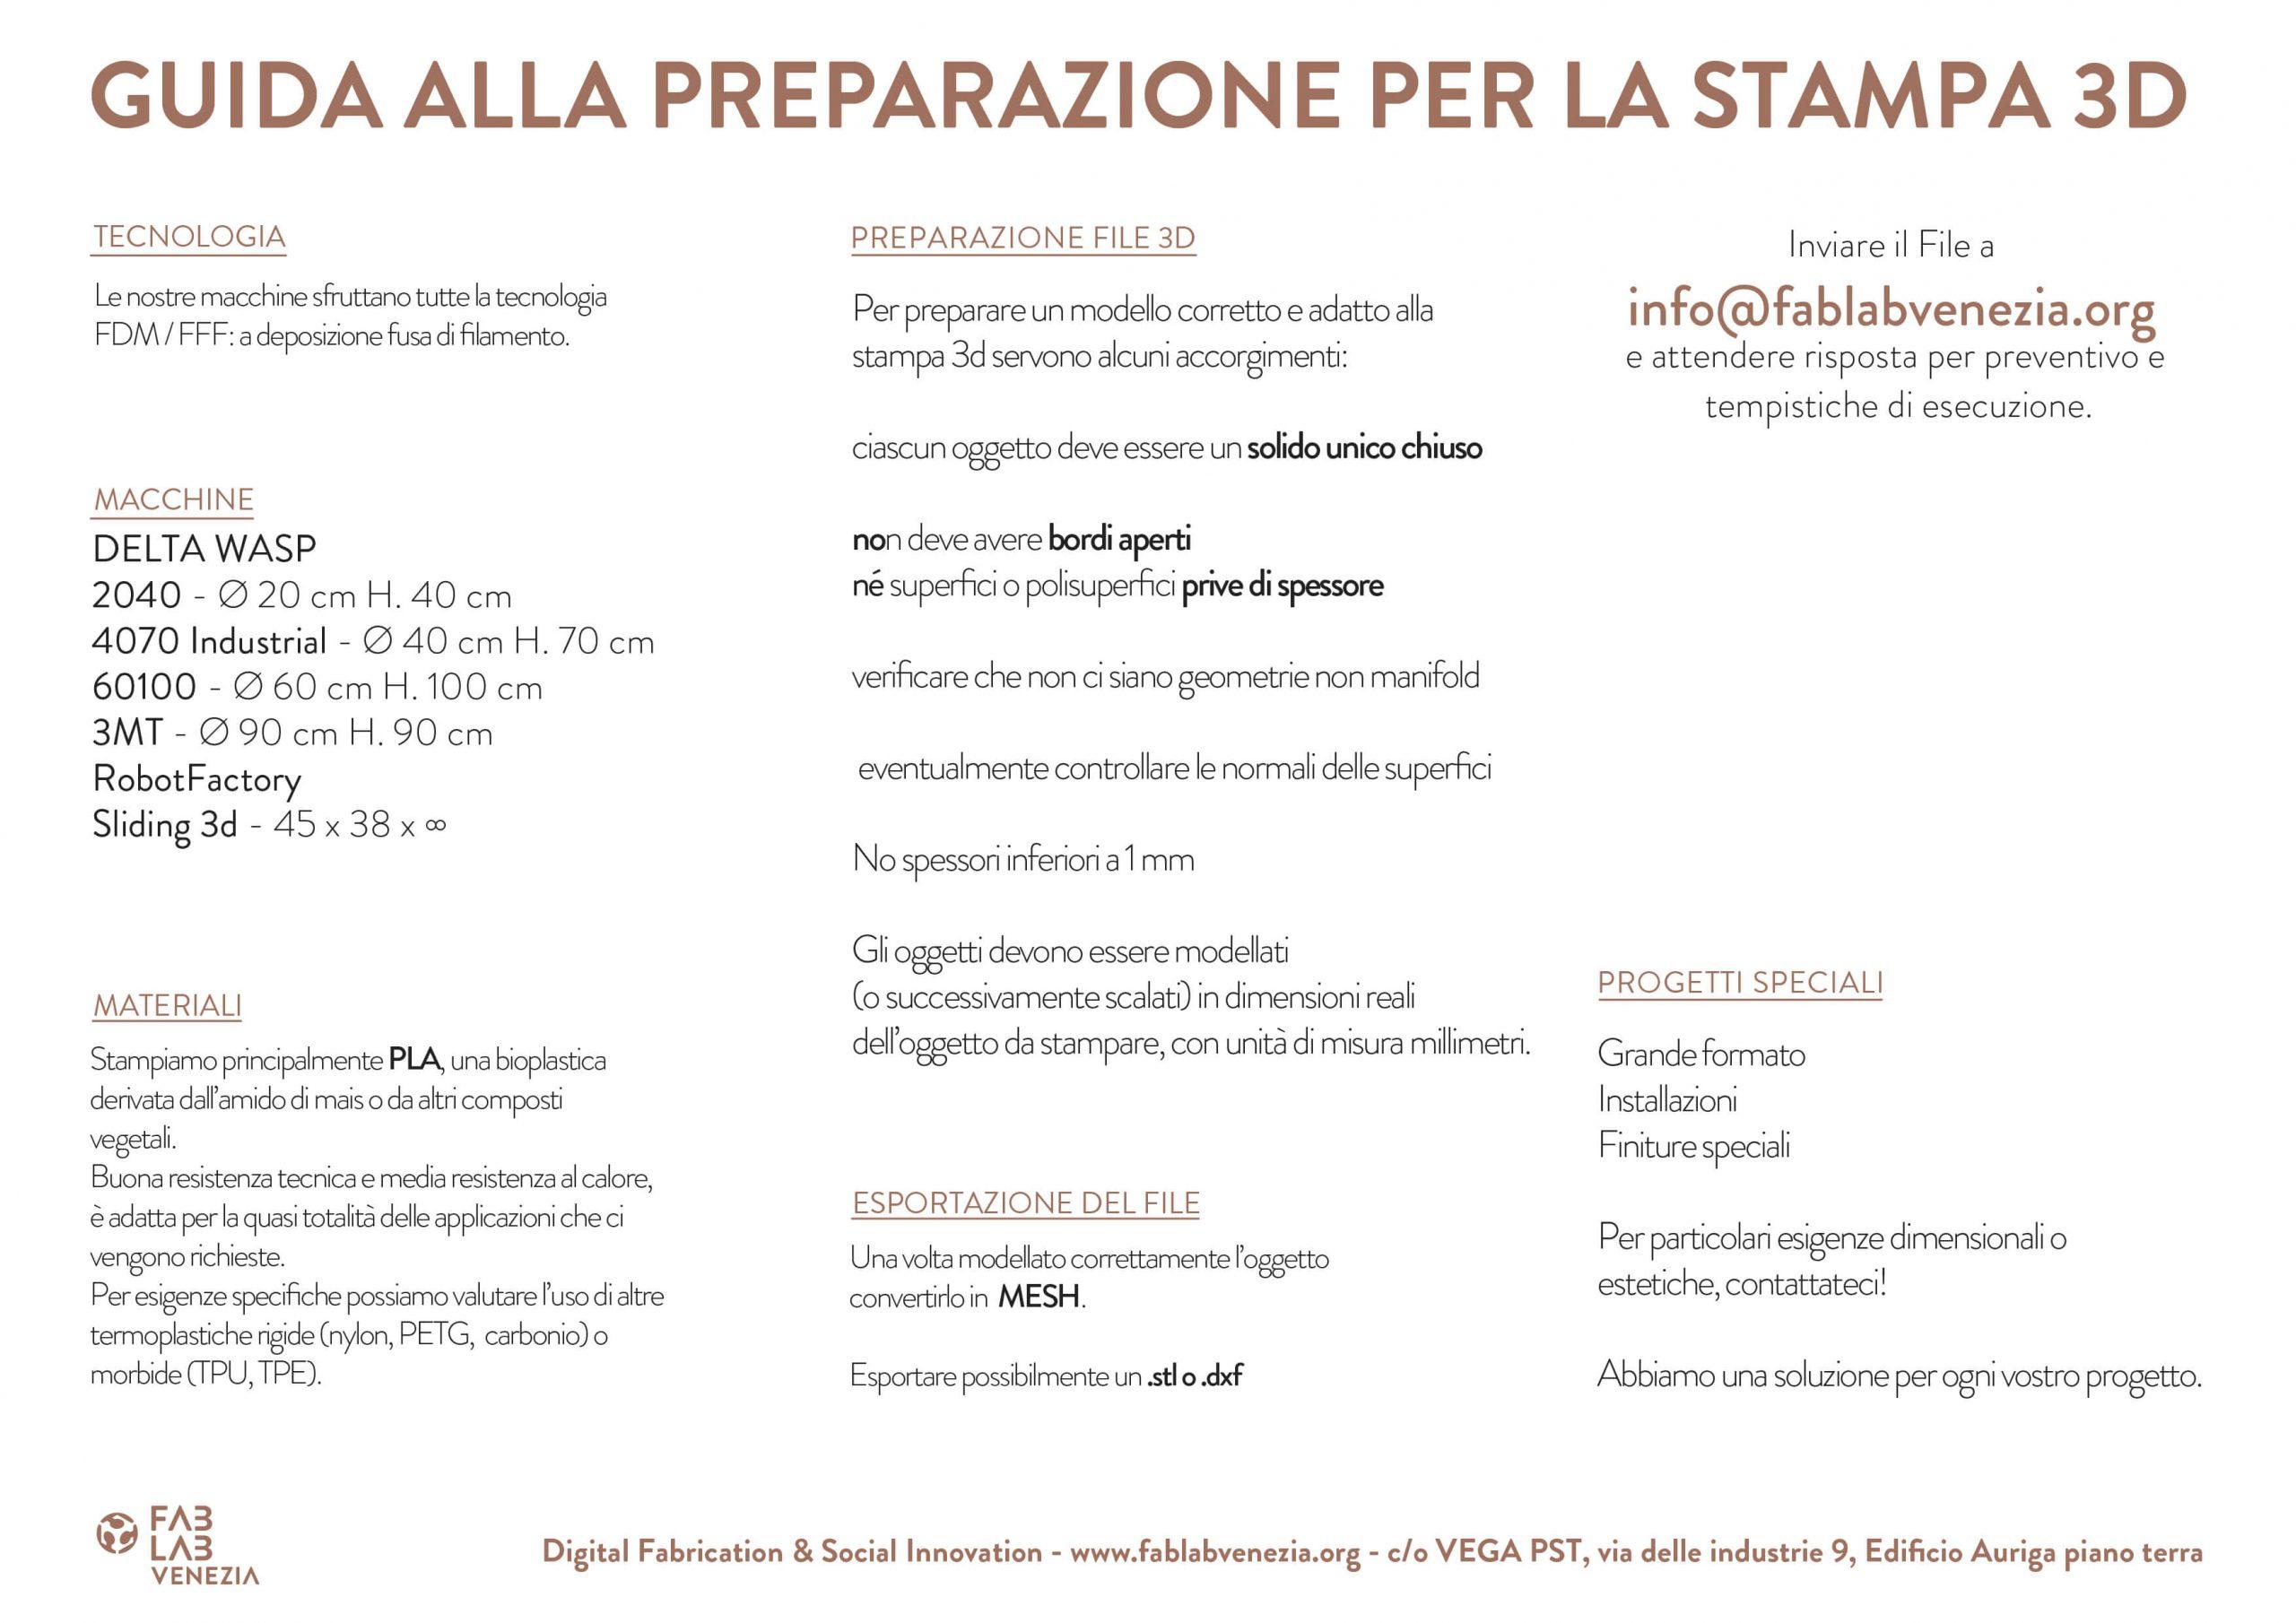 guida-stampa-3d-fablab-venezia-02